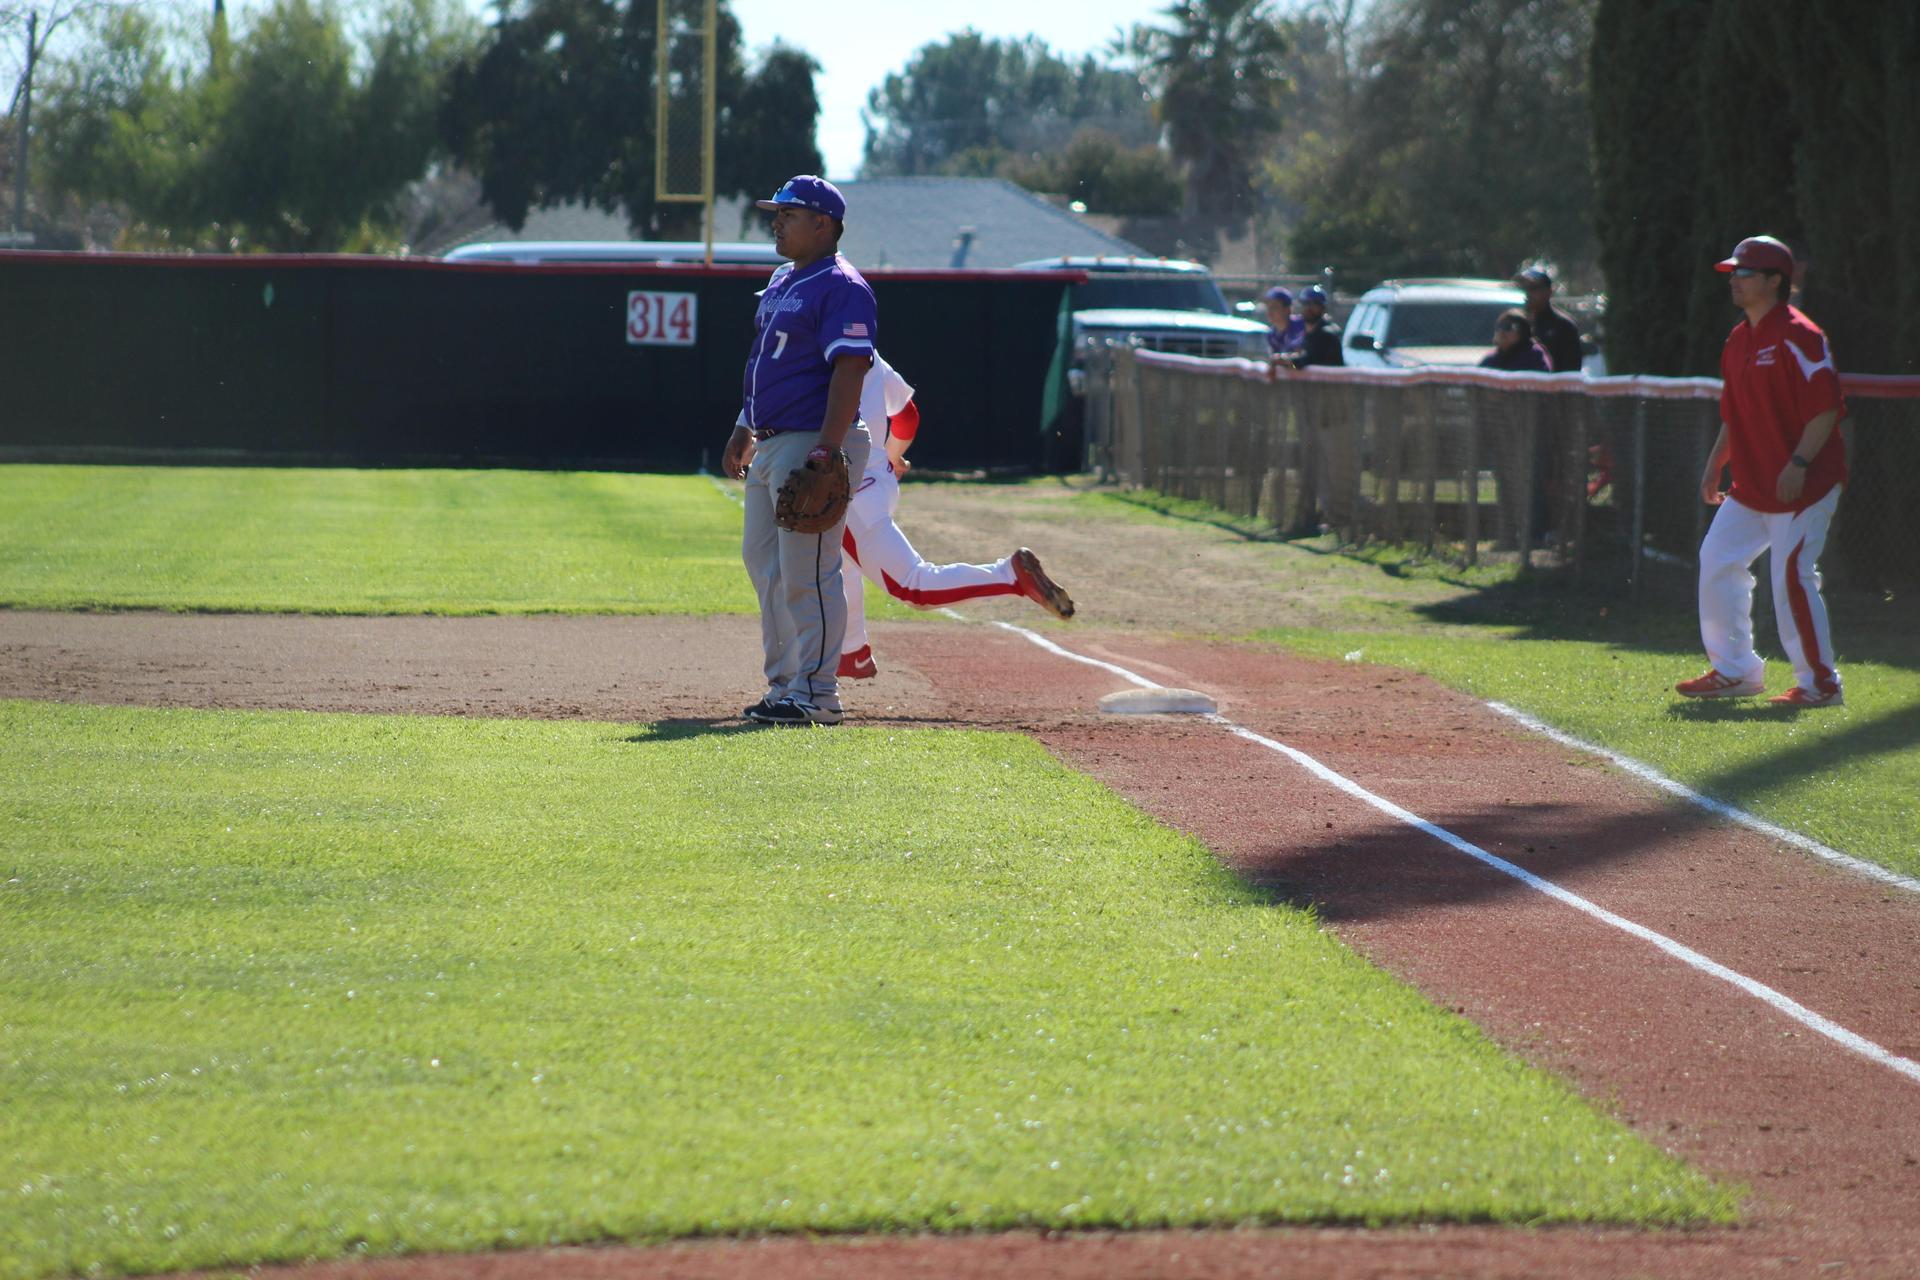 Baseball players in action against Washington Union